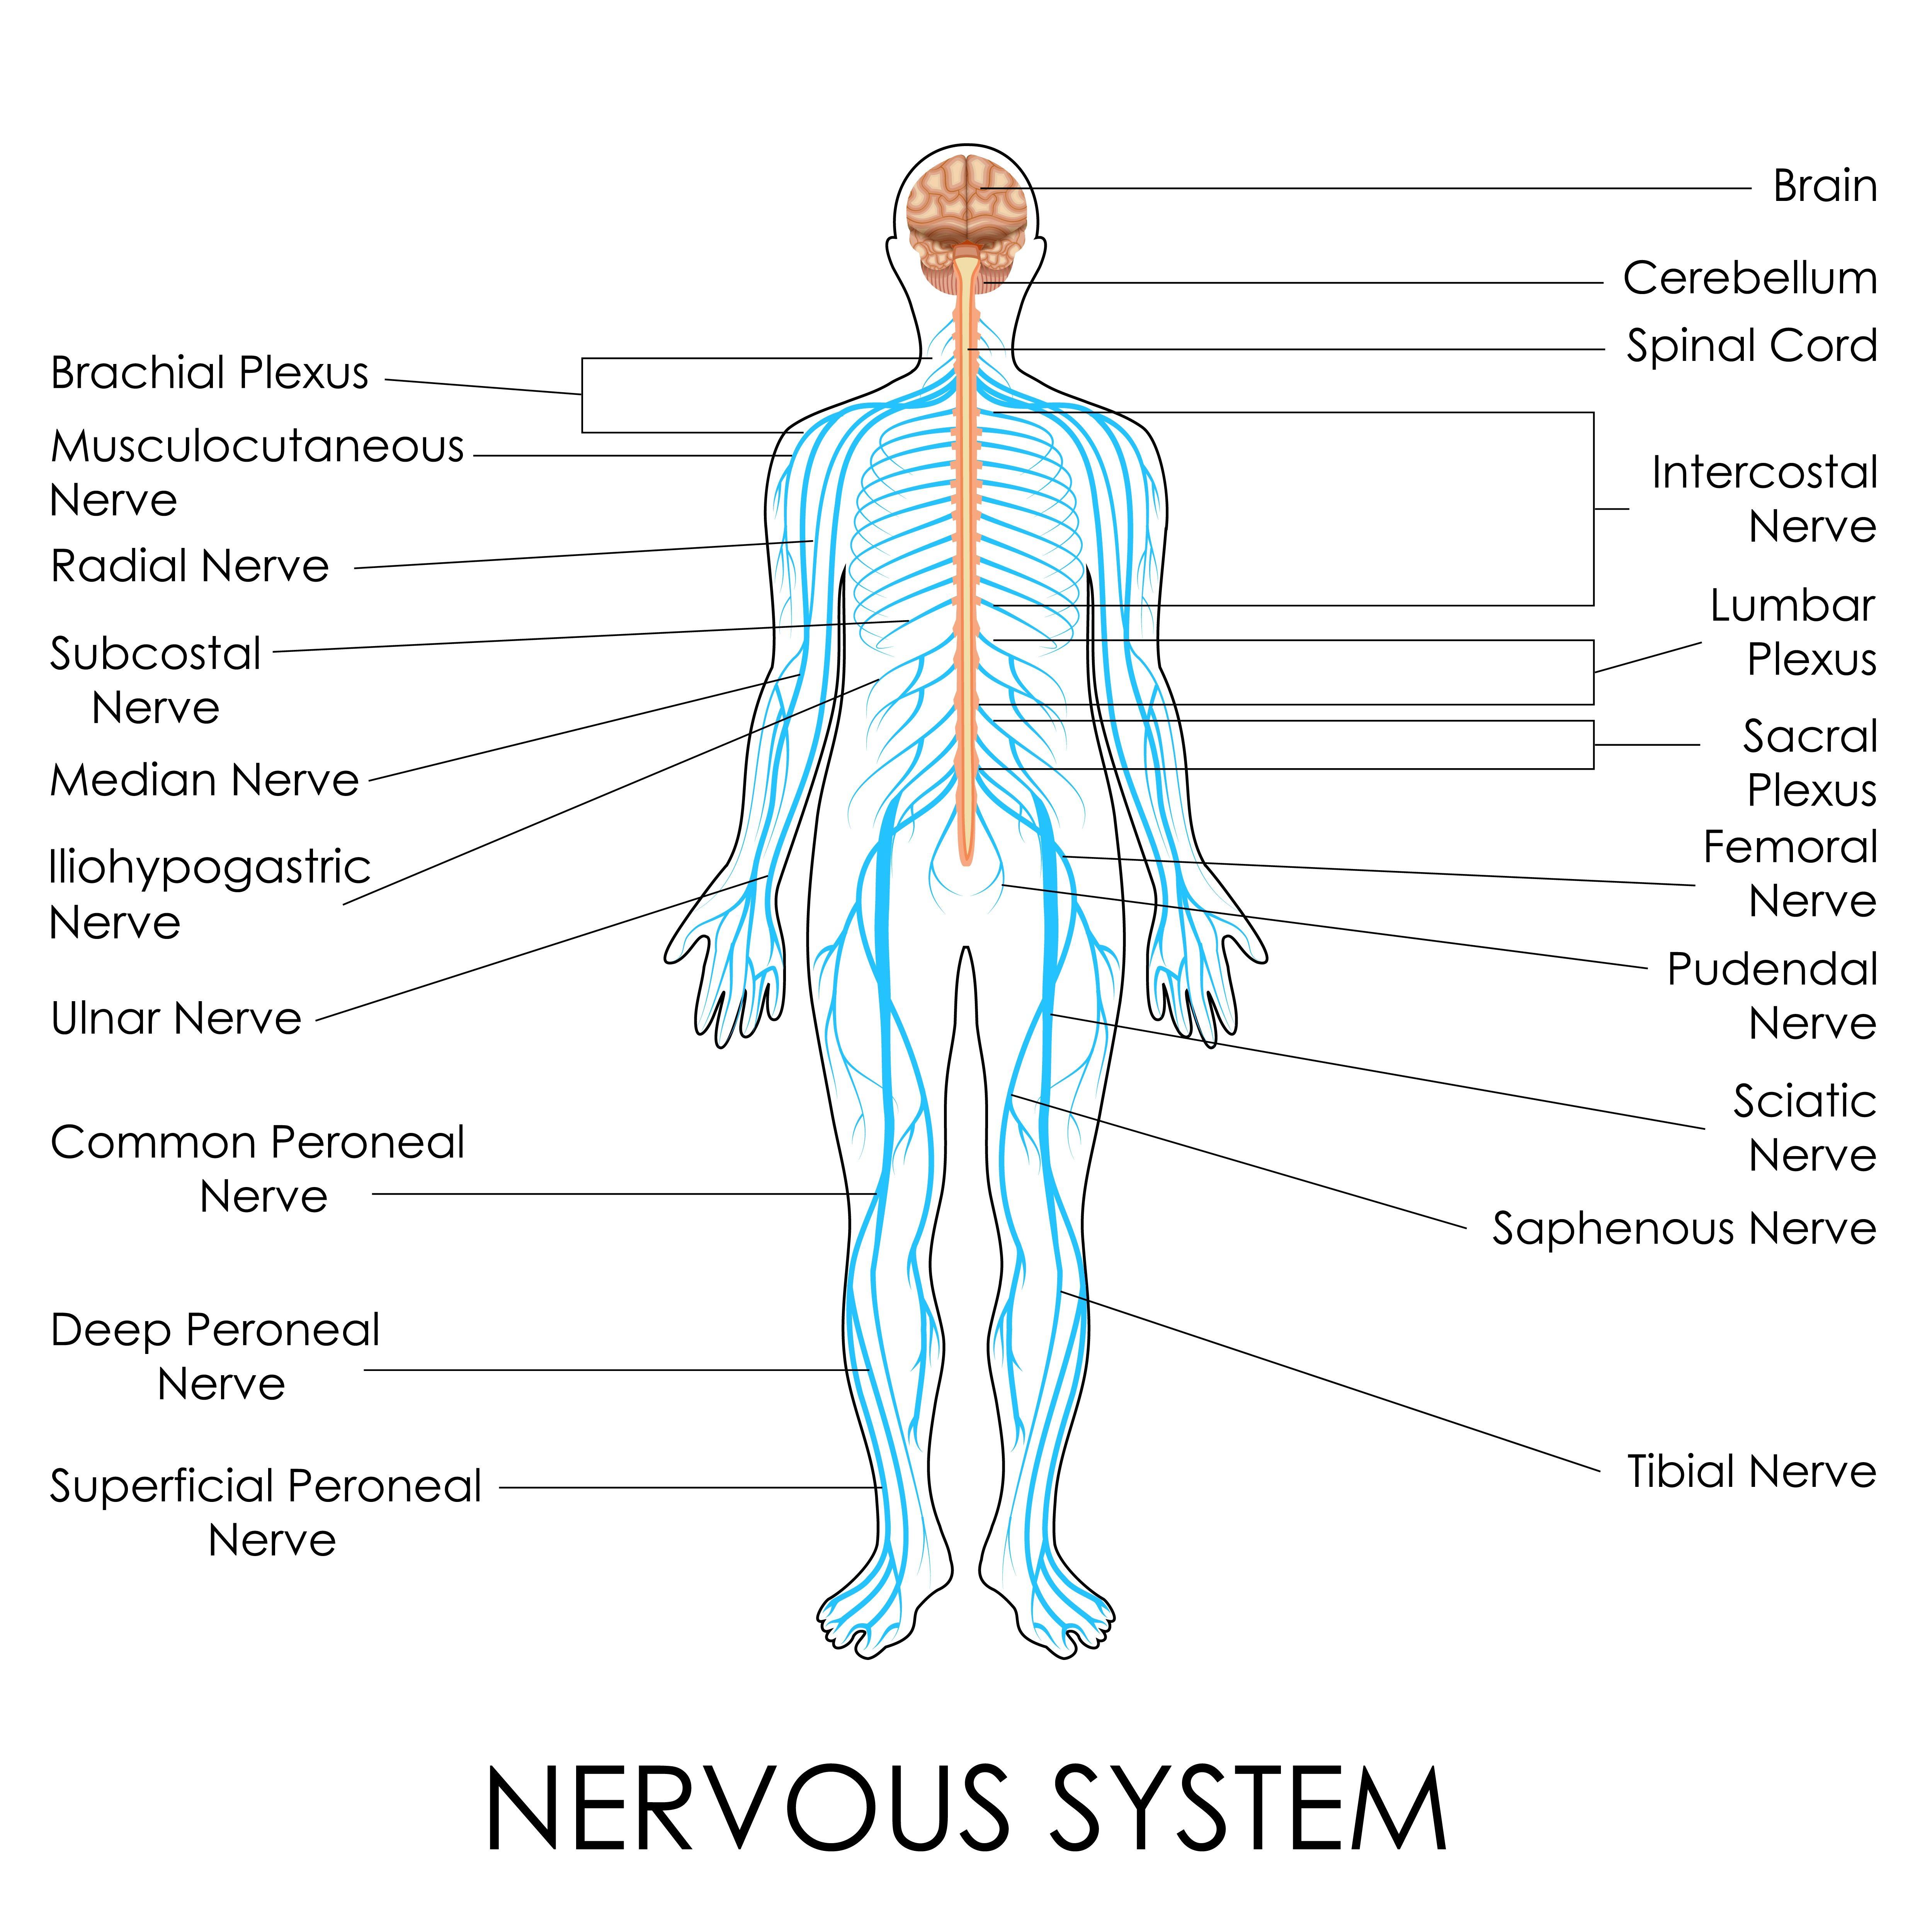 Nerves Of The Body Human Anatomy Diagram School Information Board